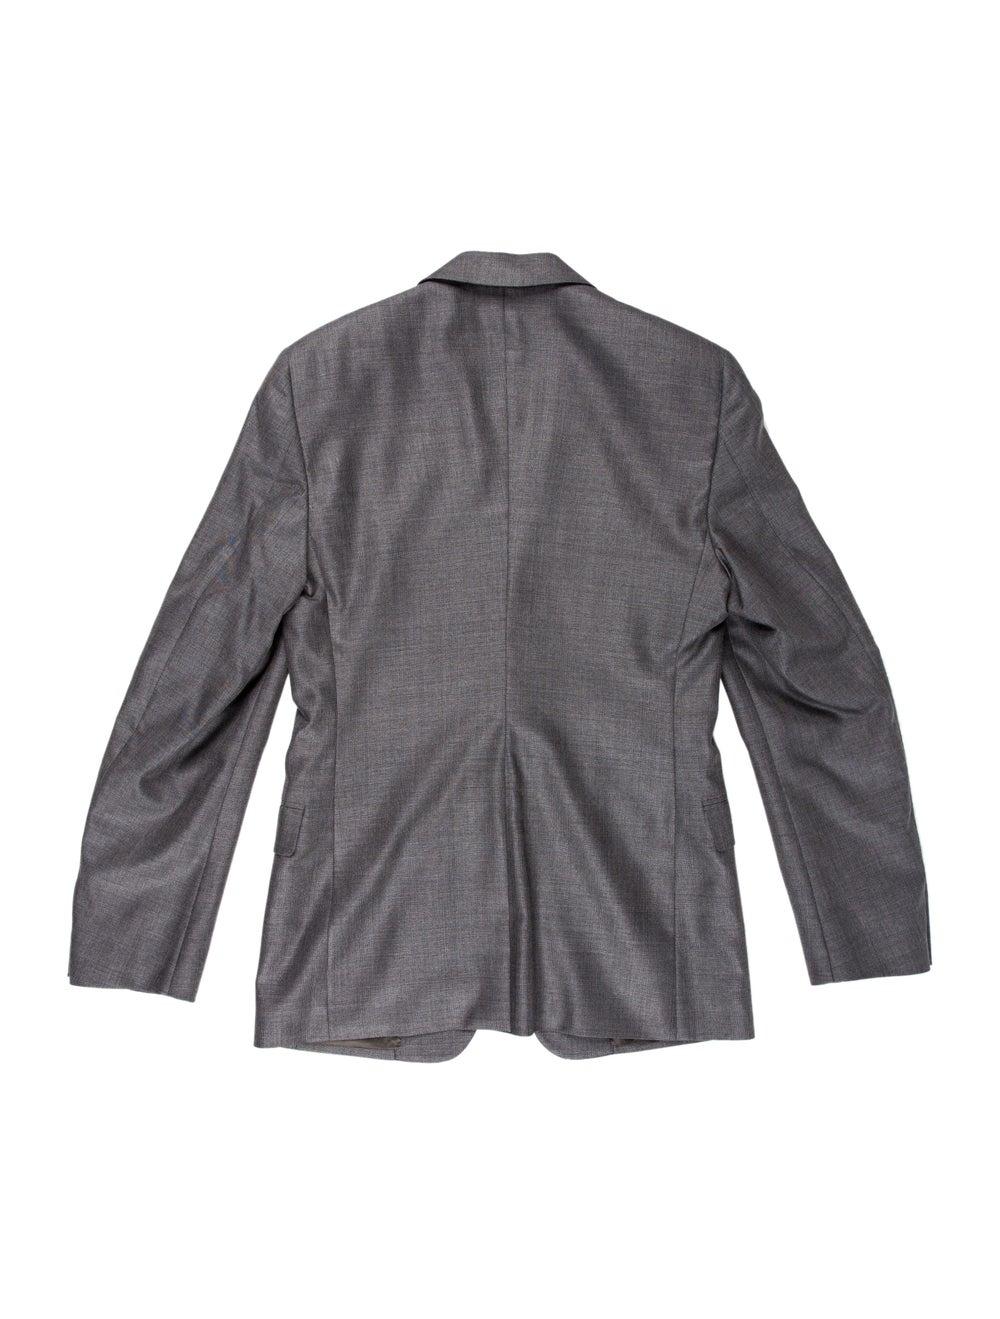 Prada Wool-Blend Two-Piece Suit grey - image 2